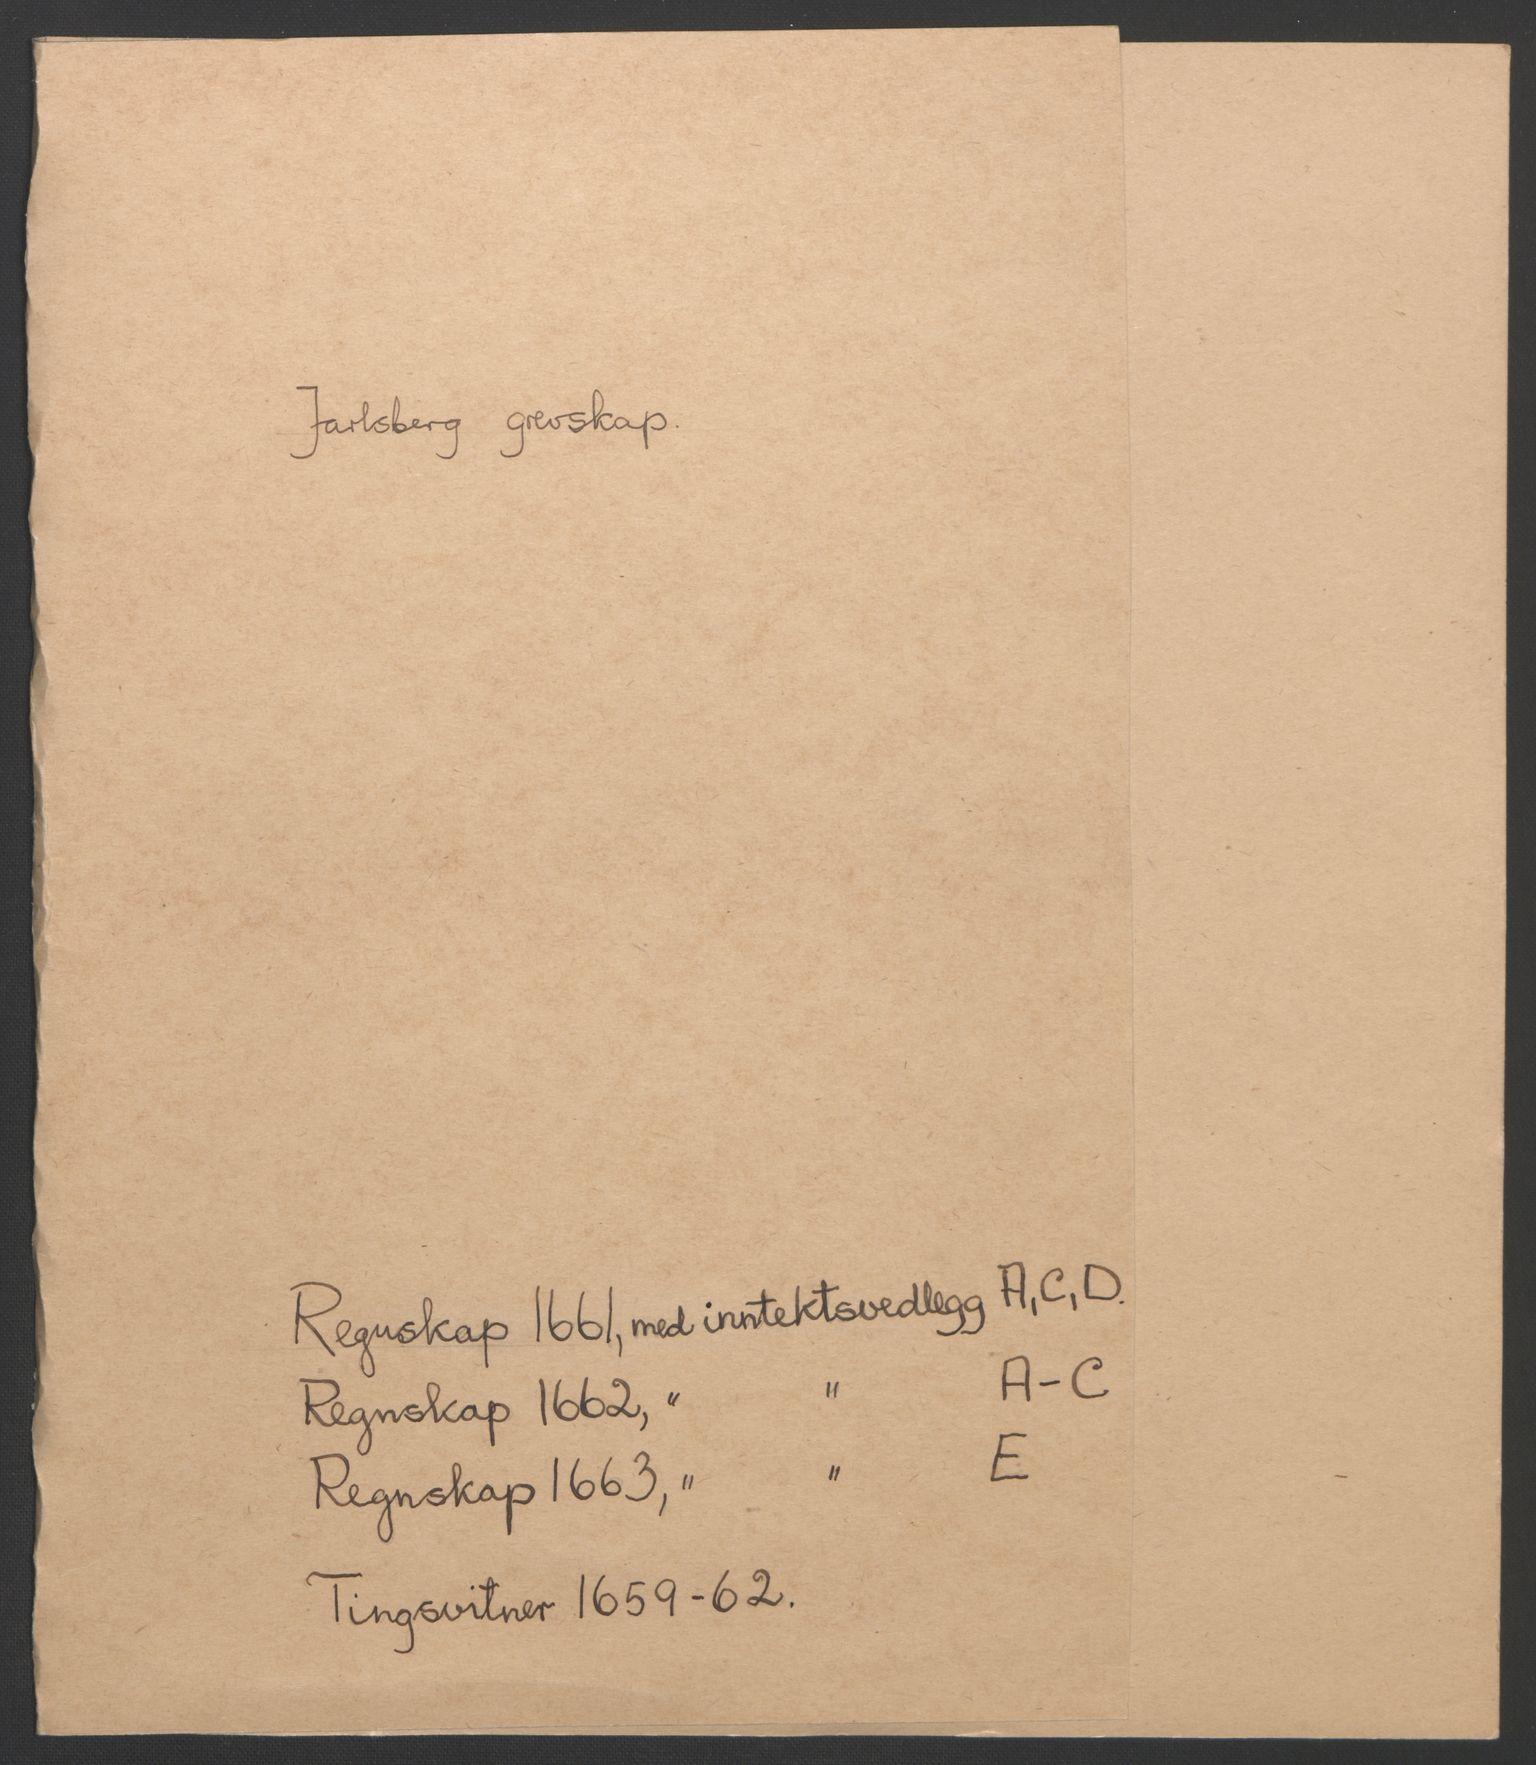 RA, Rentekammeret inntil 1814, Reviderte regnskaper, Fogderegnskap, R32/L1838: Fogderegnskap Jarlsberg grevskap, 1661-1663, s. 2